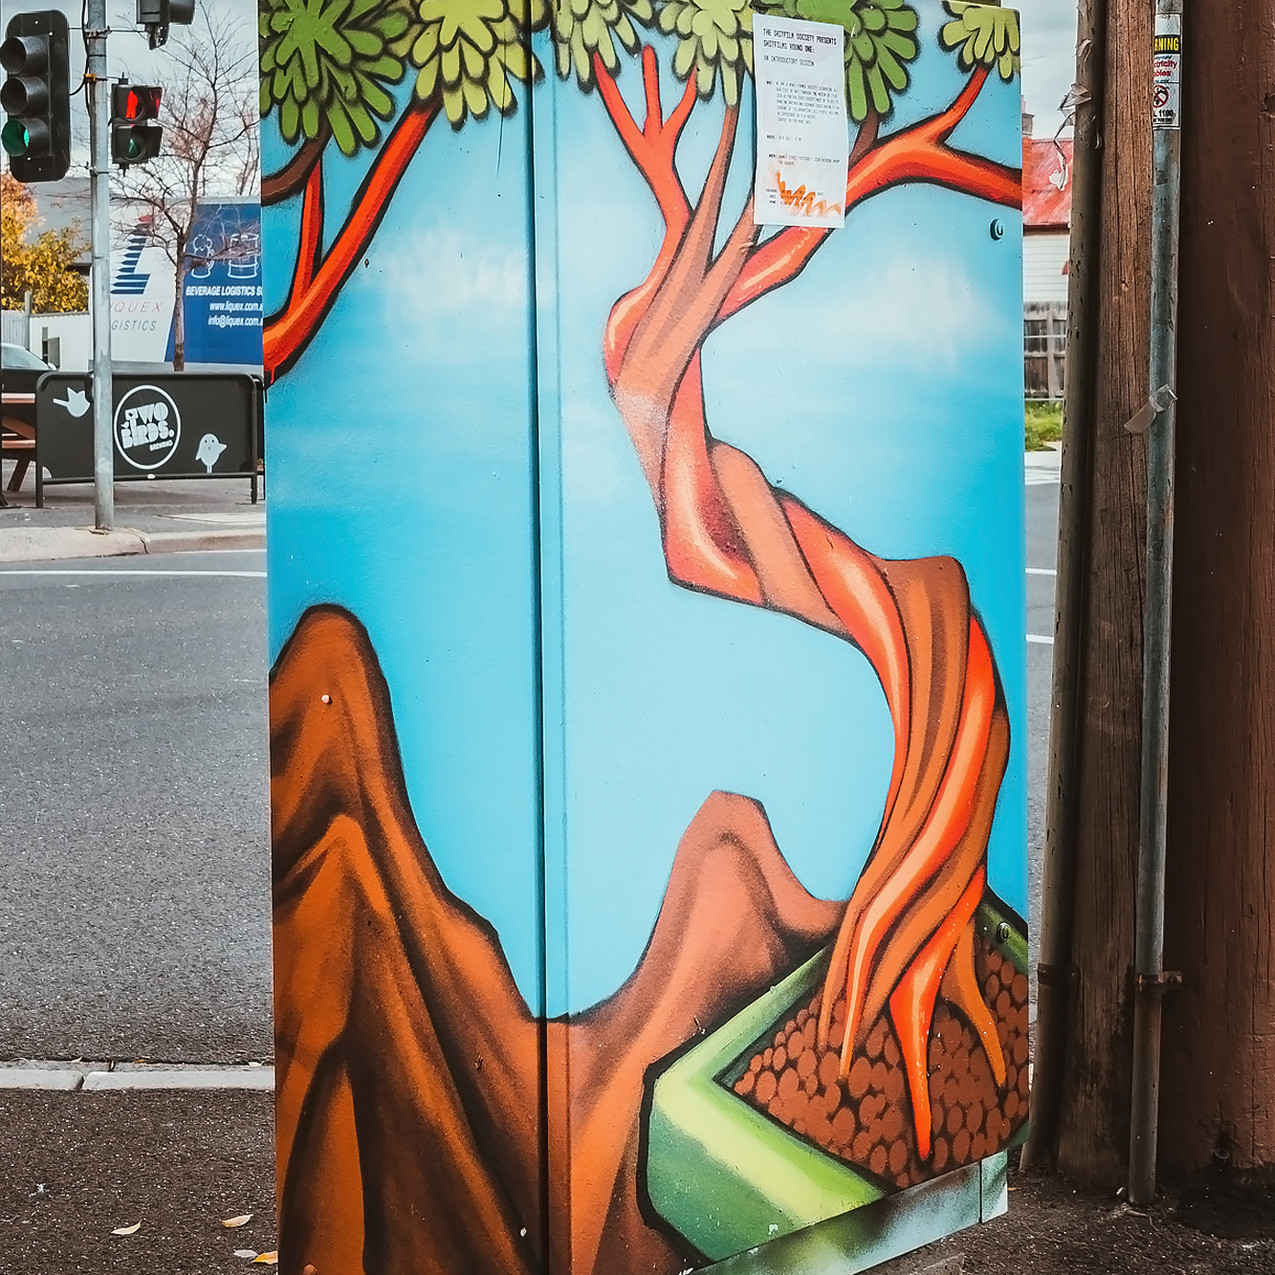 West Footscray Fusebox - Drewfunk